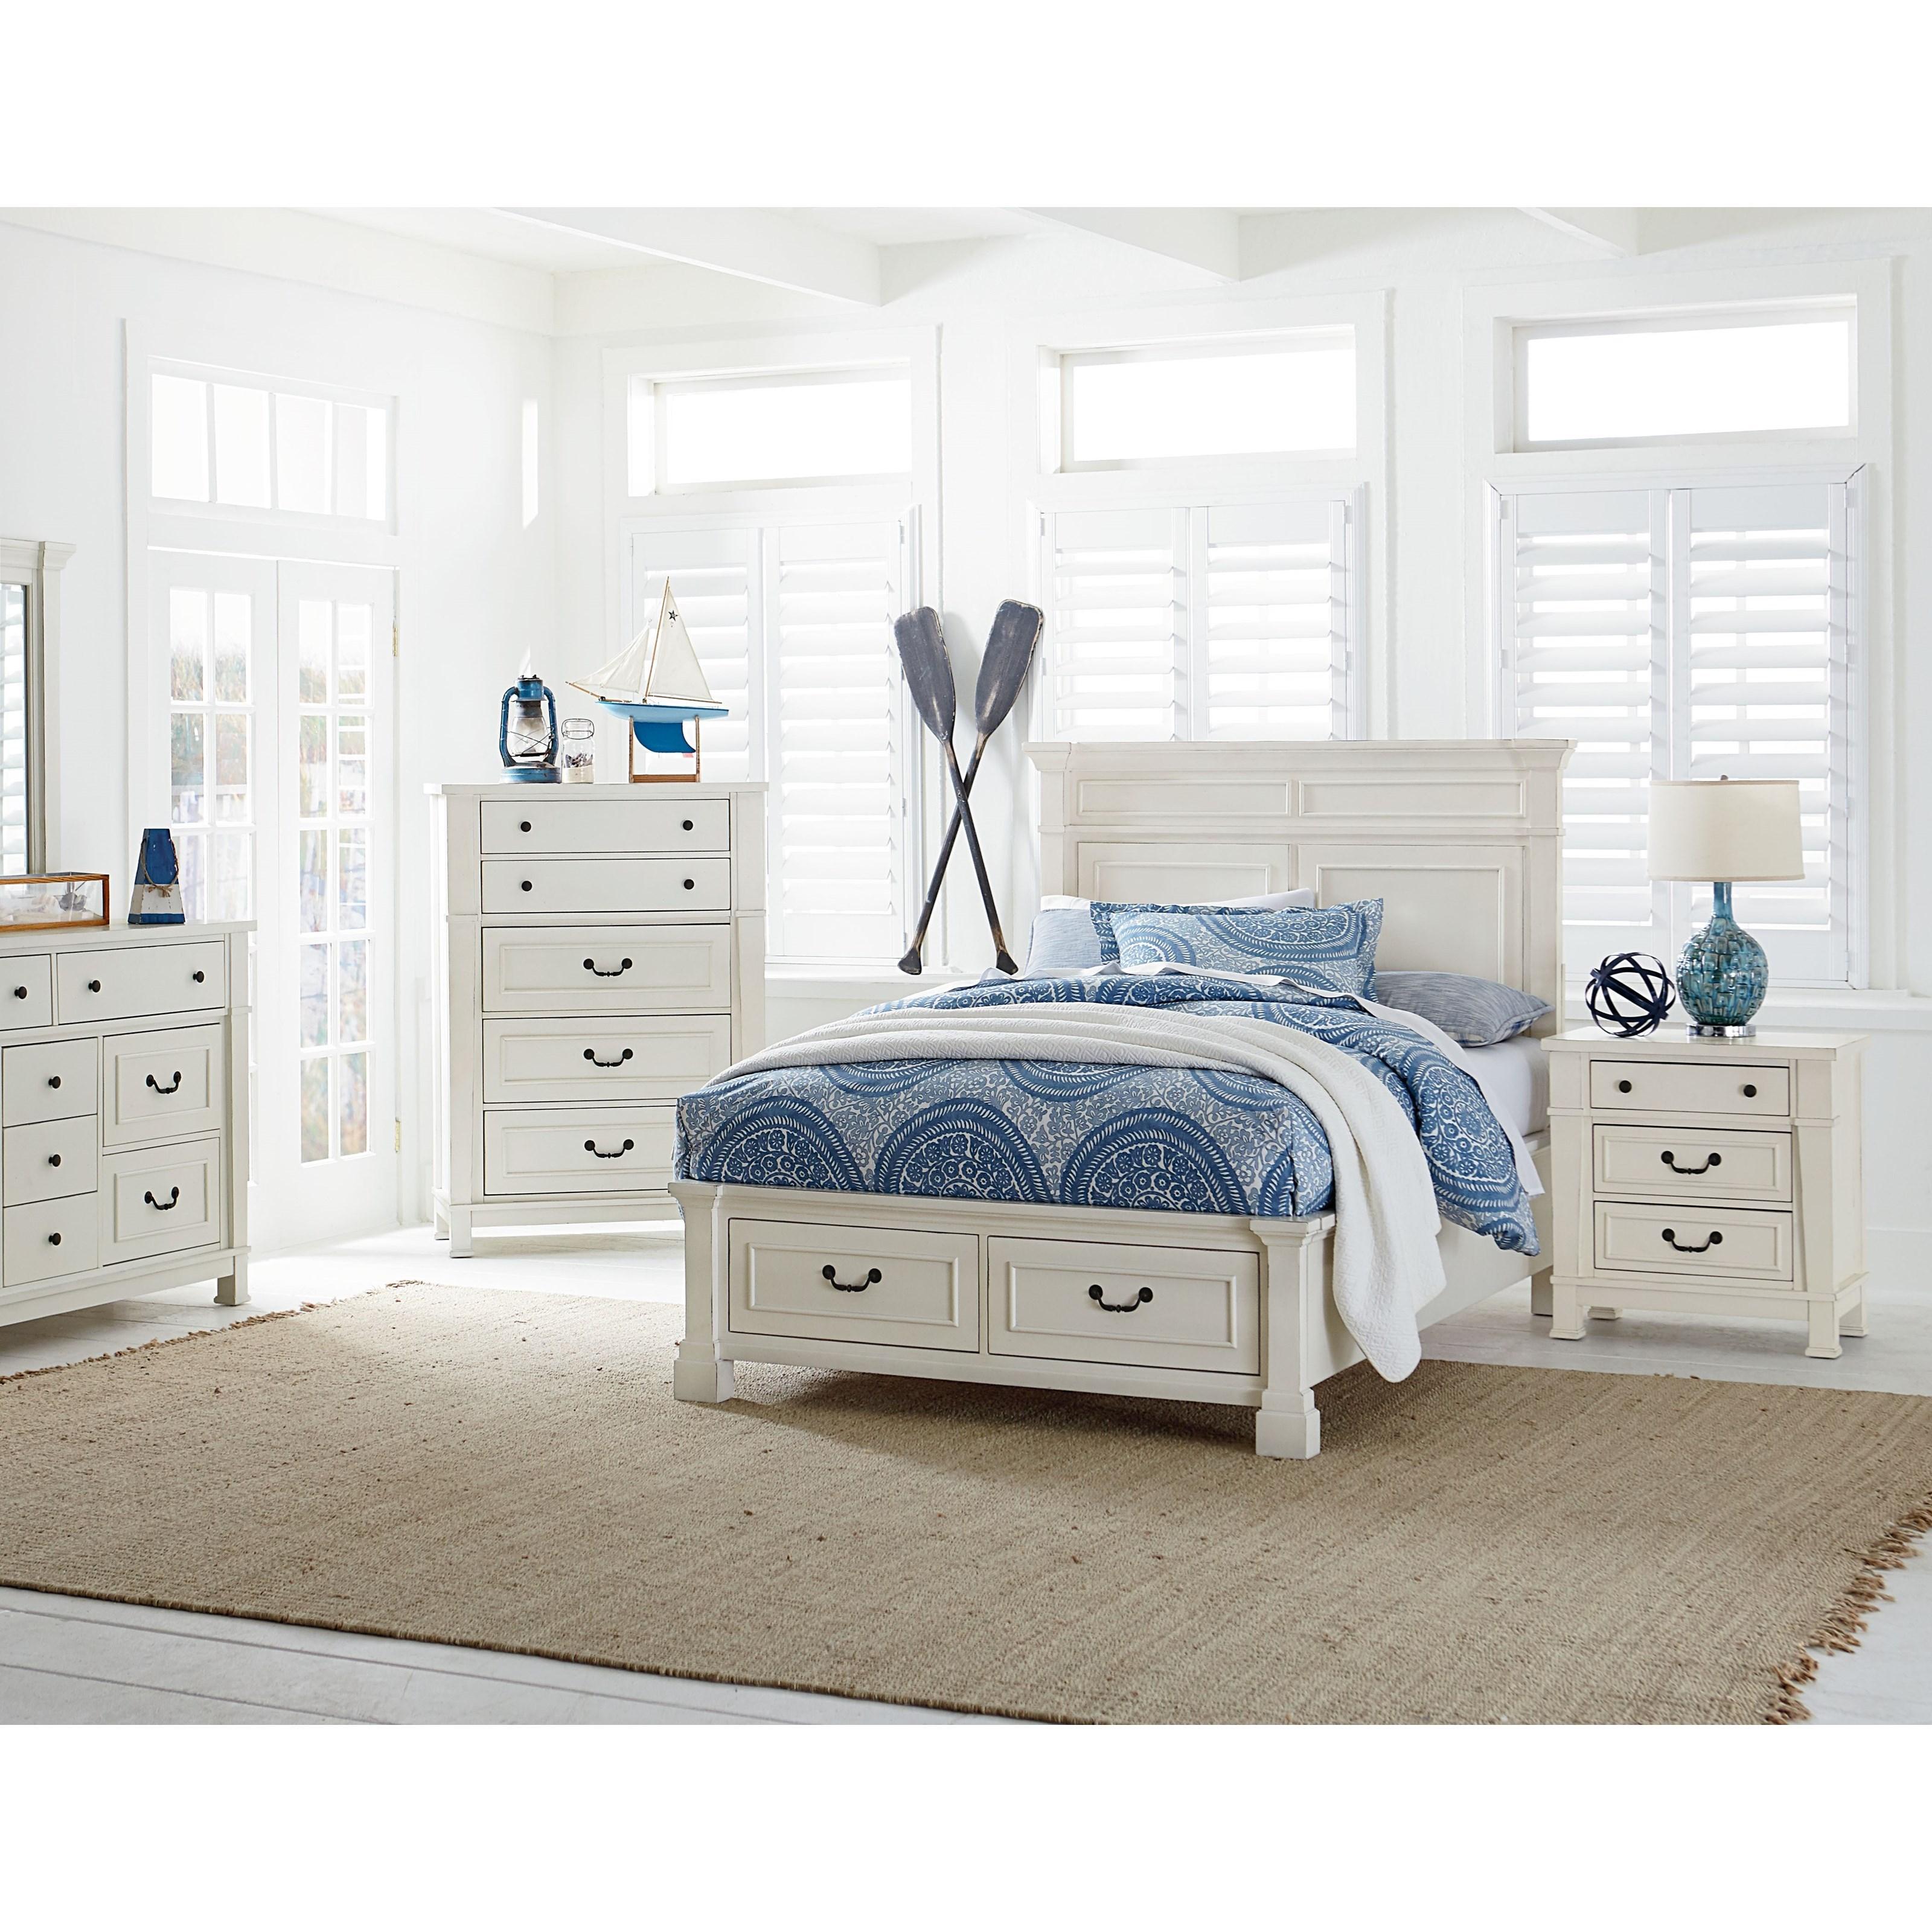 Standard Furniture Chesapeake Bay Queen Storage Bedroom